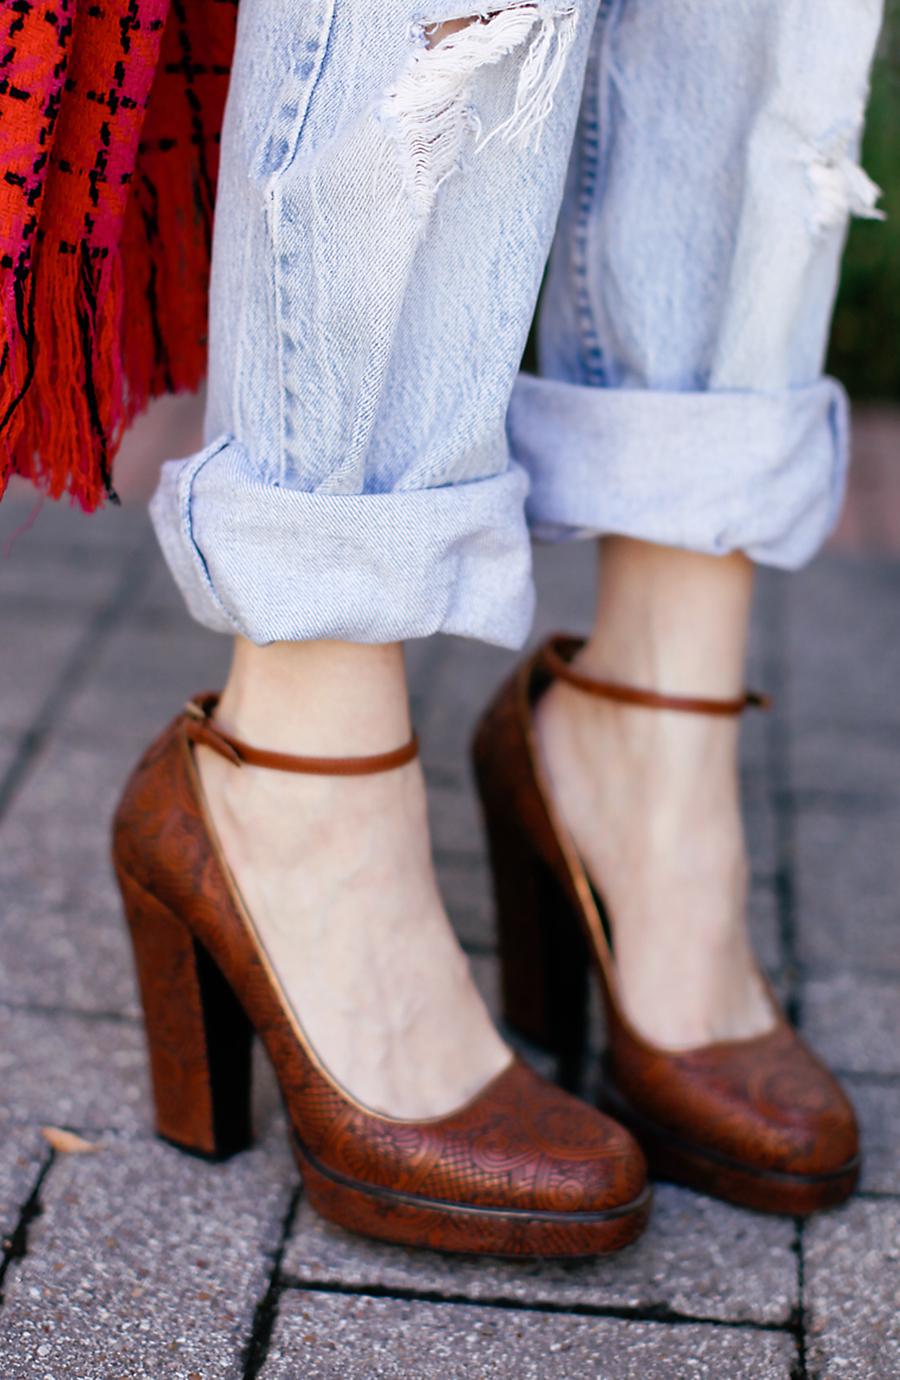 VINTAGE LOUIS FERAUD - Sea of Shoes